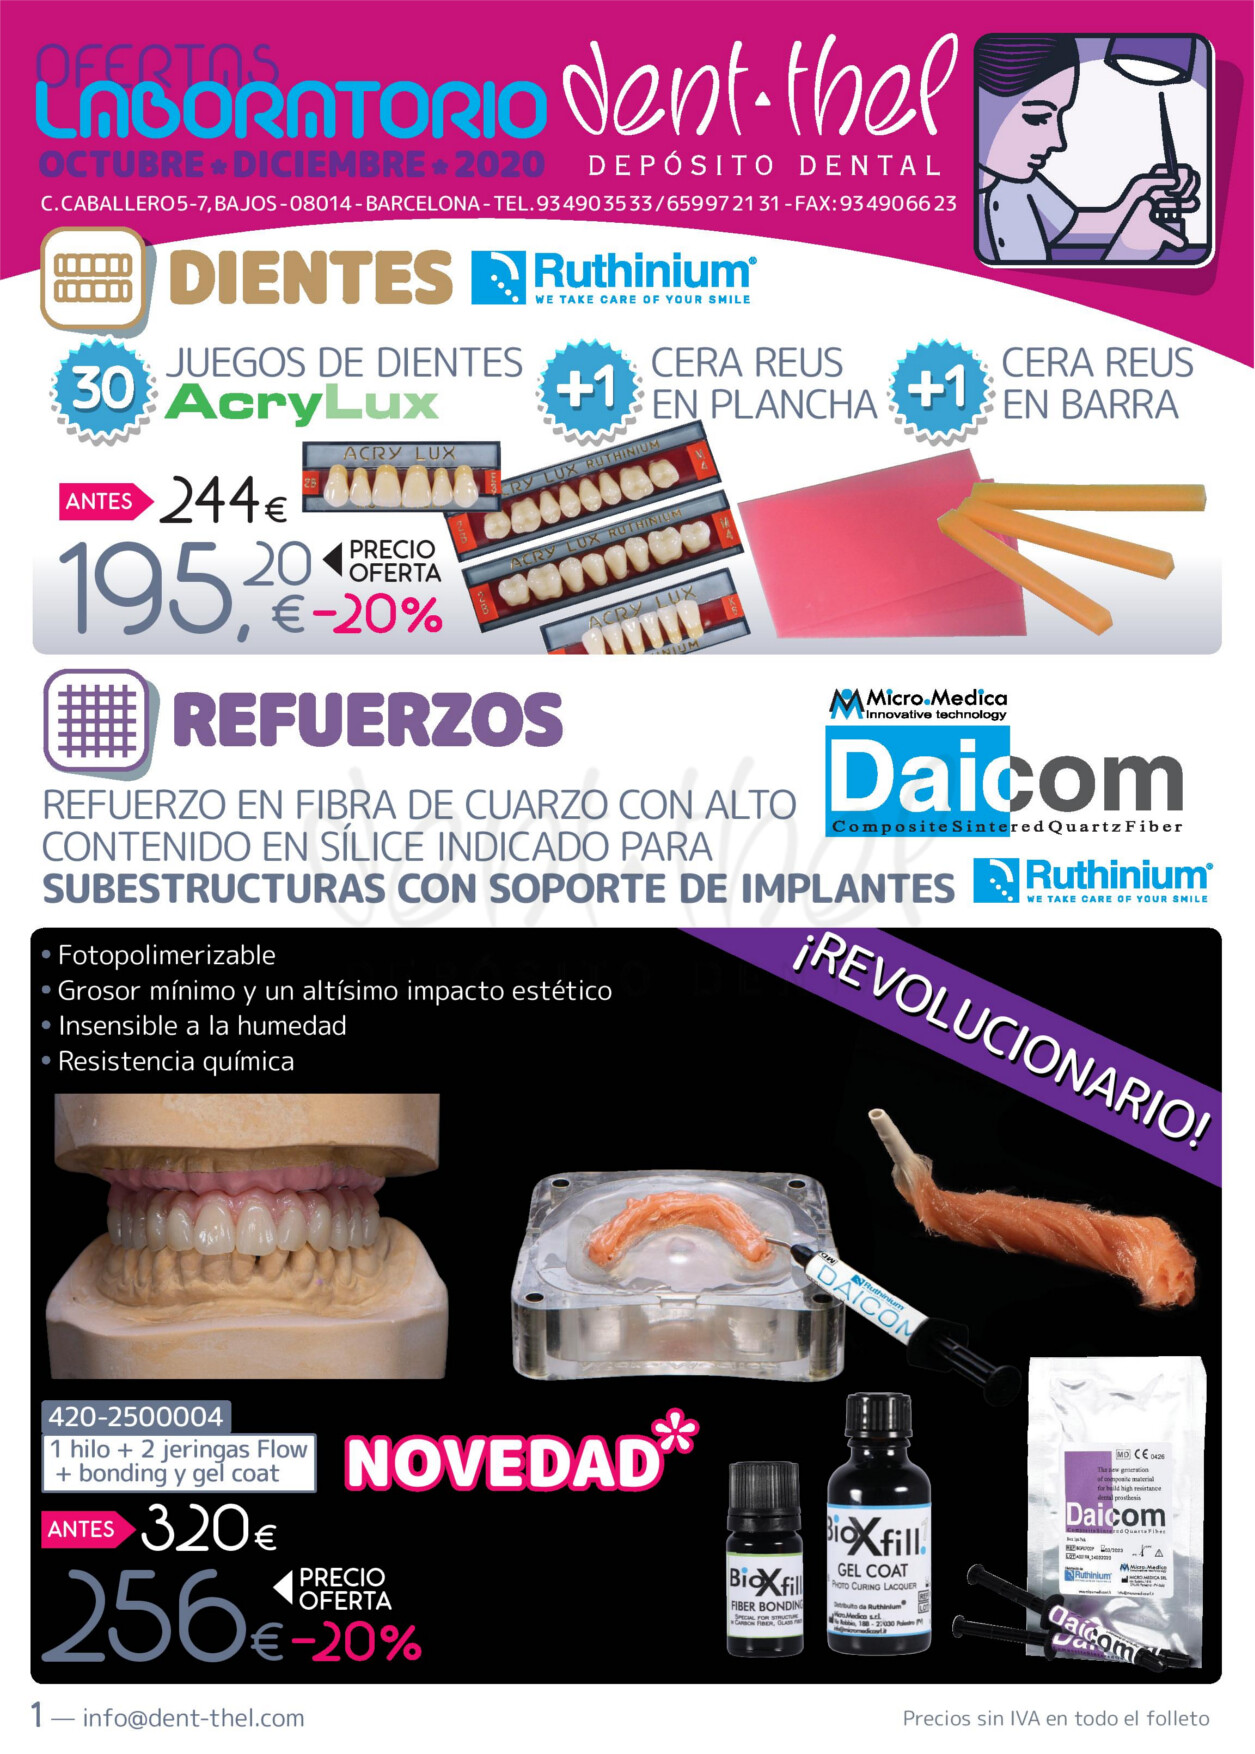 Ofertas Dent-thel para laboratorio